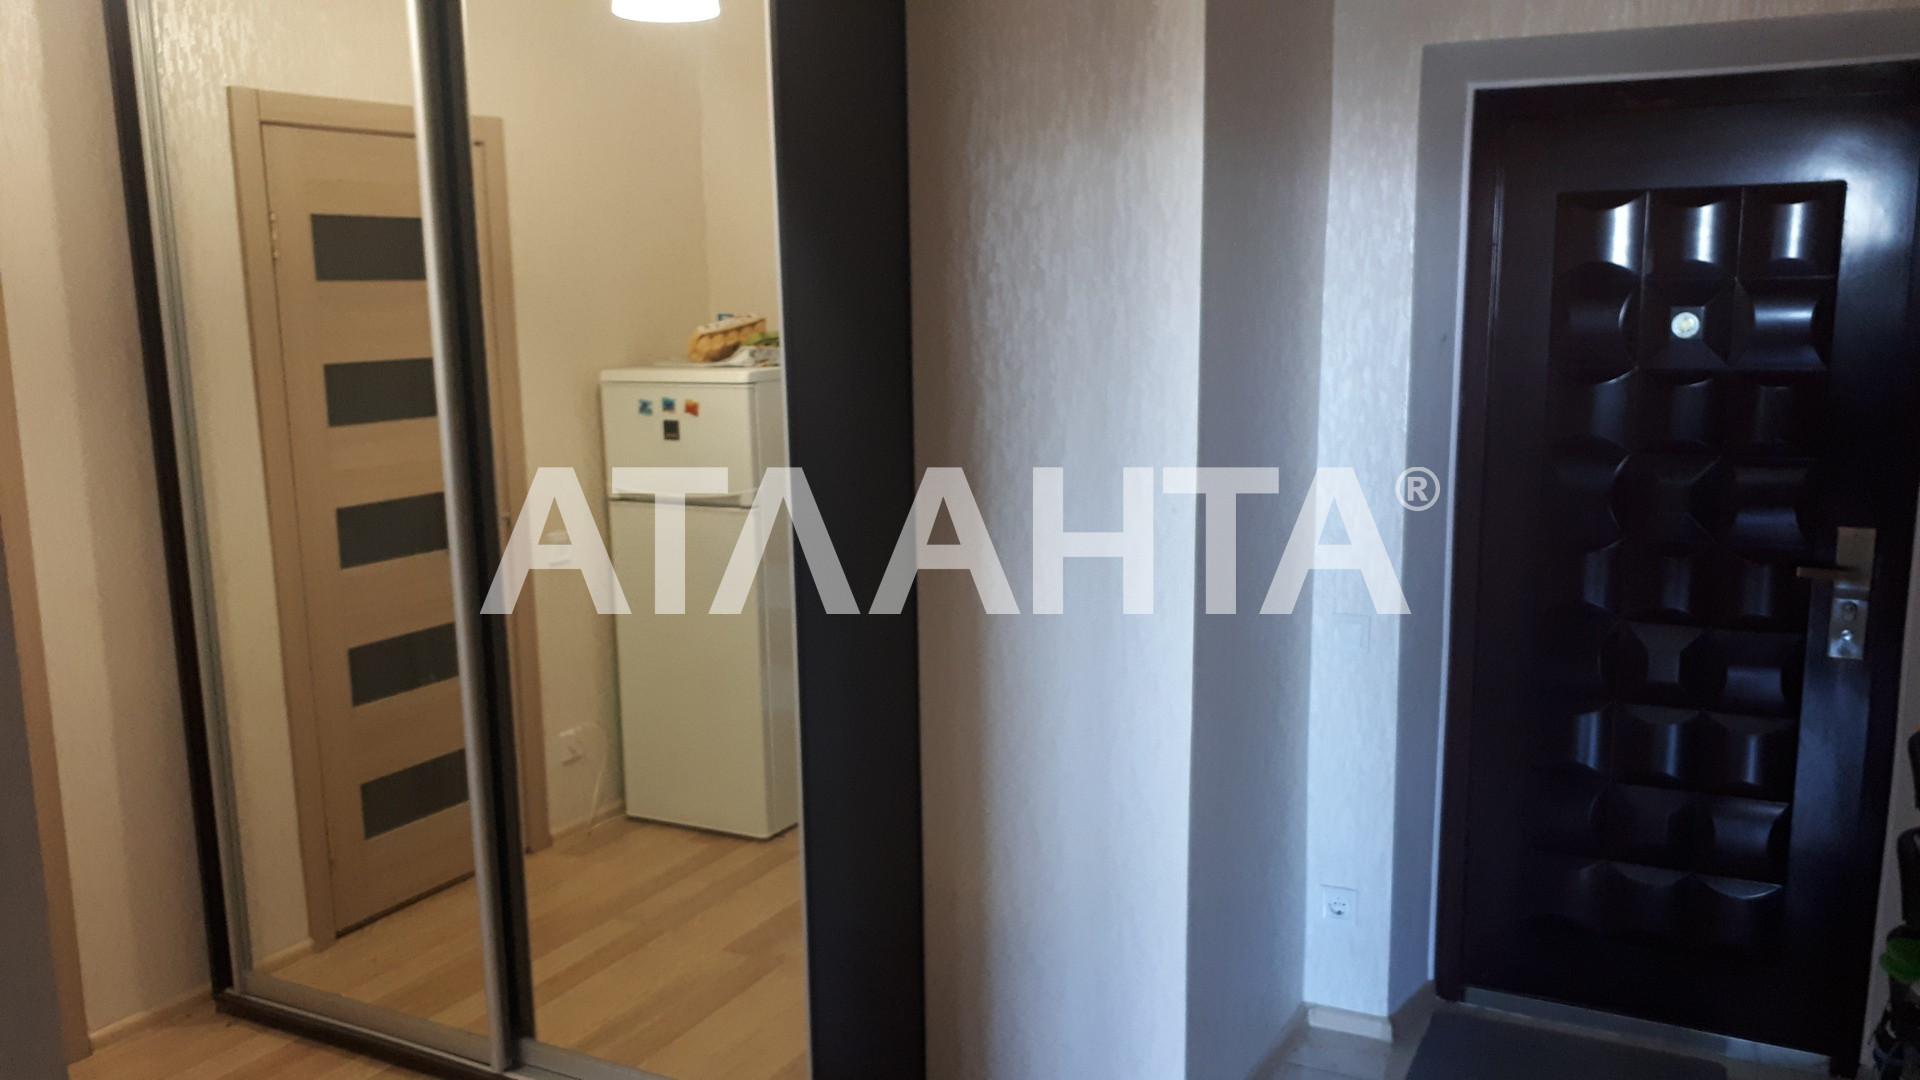 Продается 2-комнатная Квартира на ул. Хантадзе Пер. — 63 000 у.е. (фото №6)